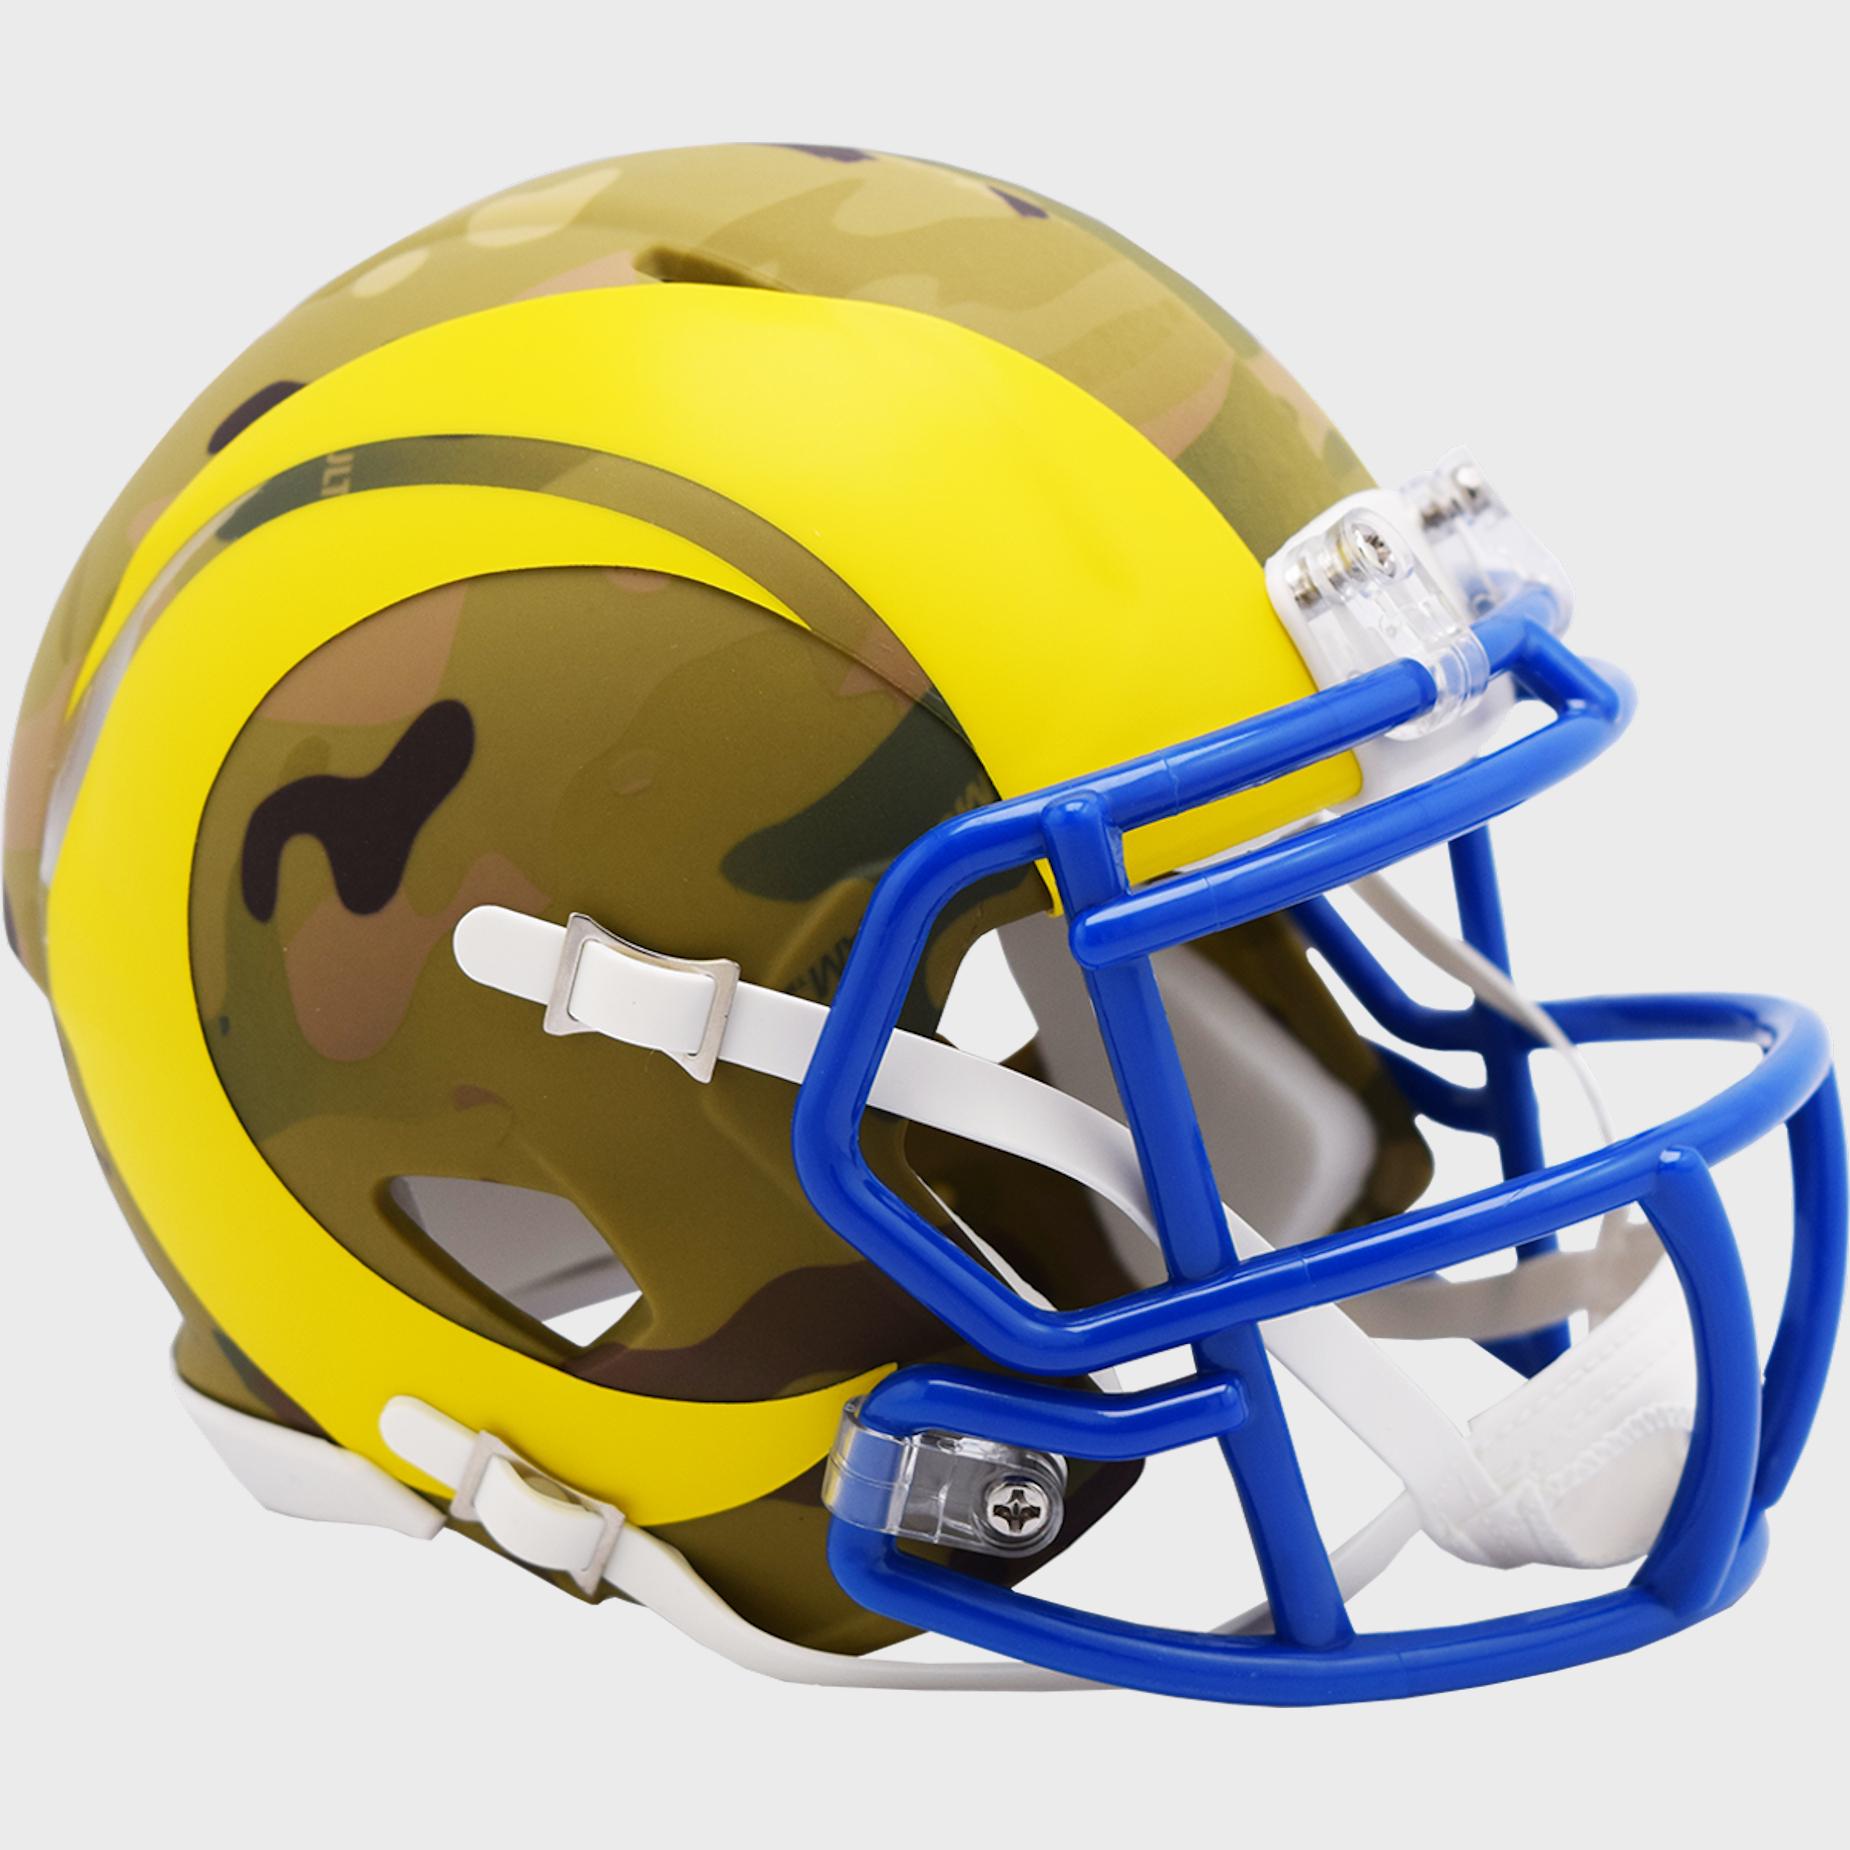 Los Angeles Rams NFL Mini Speed Football Helmet <B>CAMO</B>